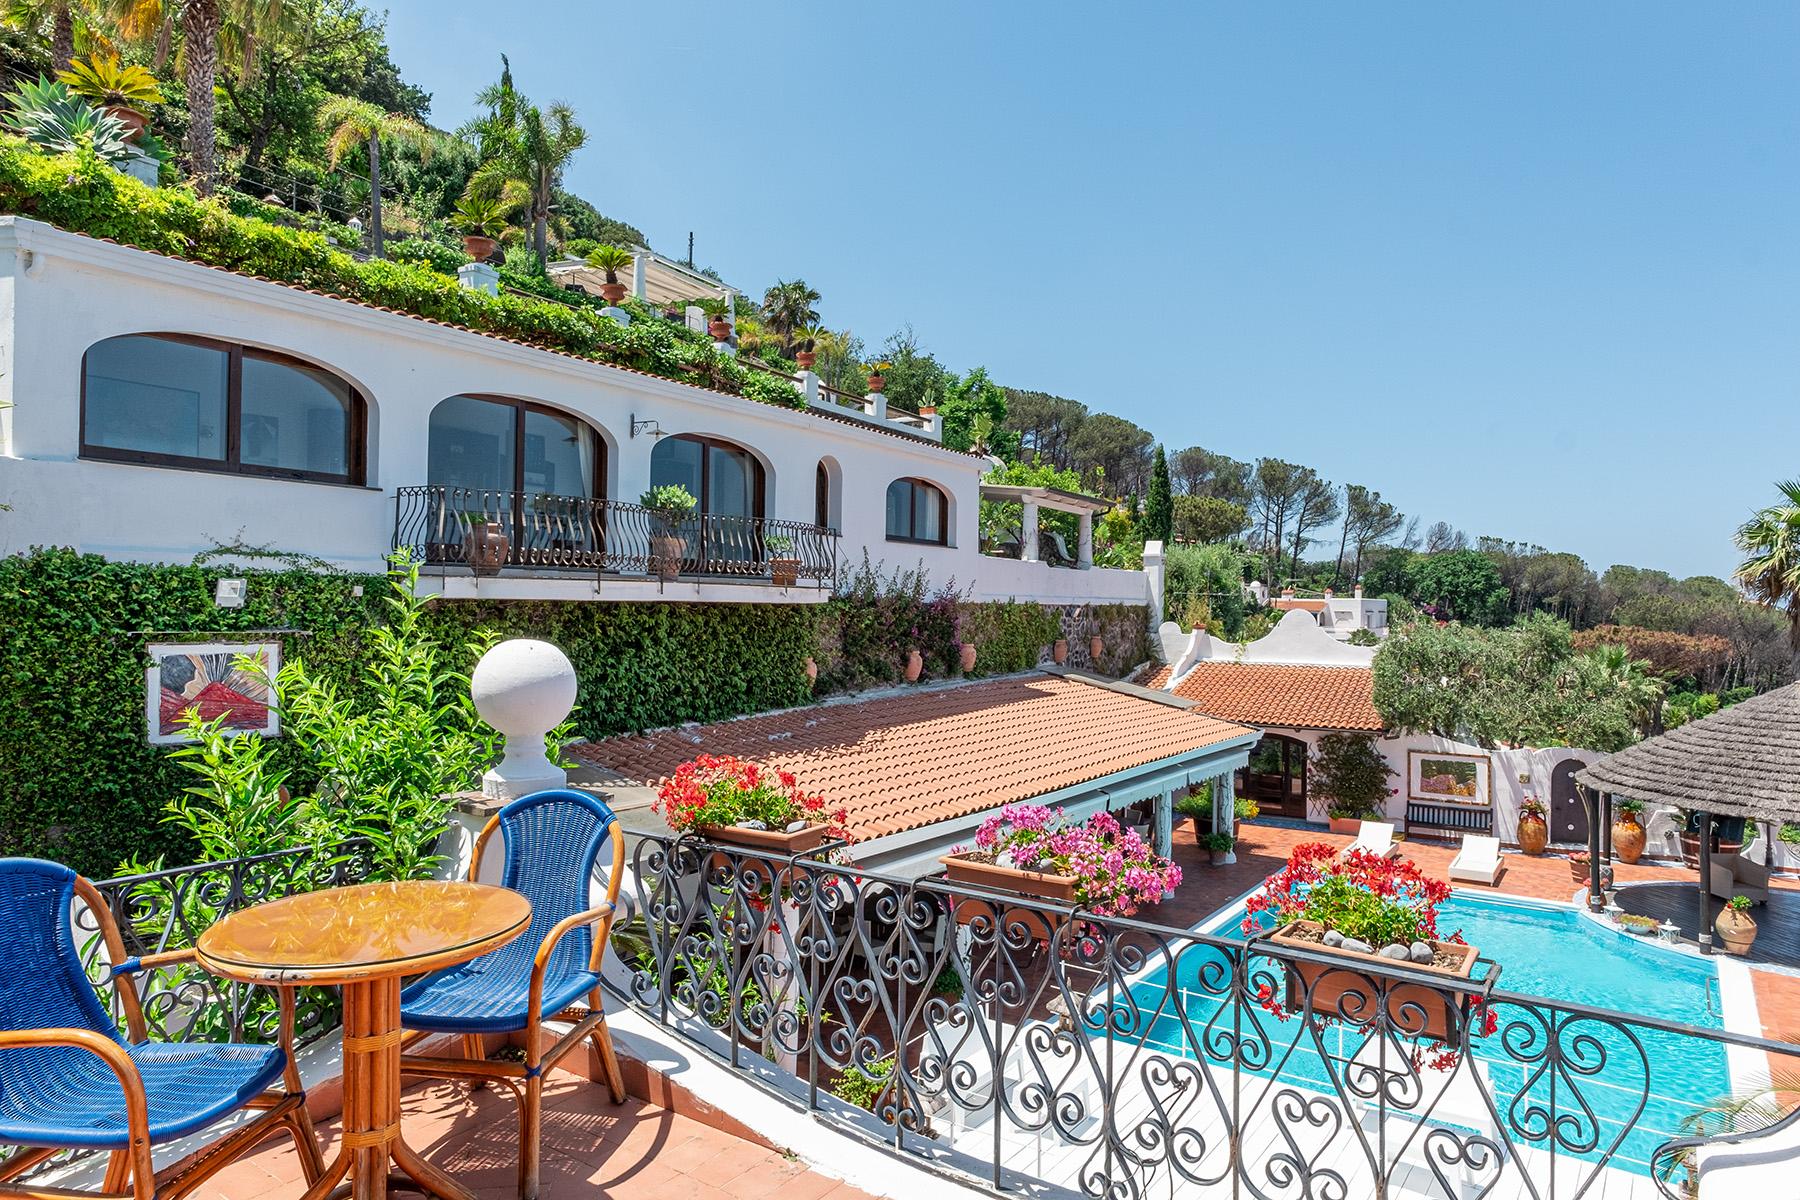 Villa in Vendita a Ischia: 5 locali, 500 mq - Foto 17